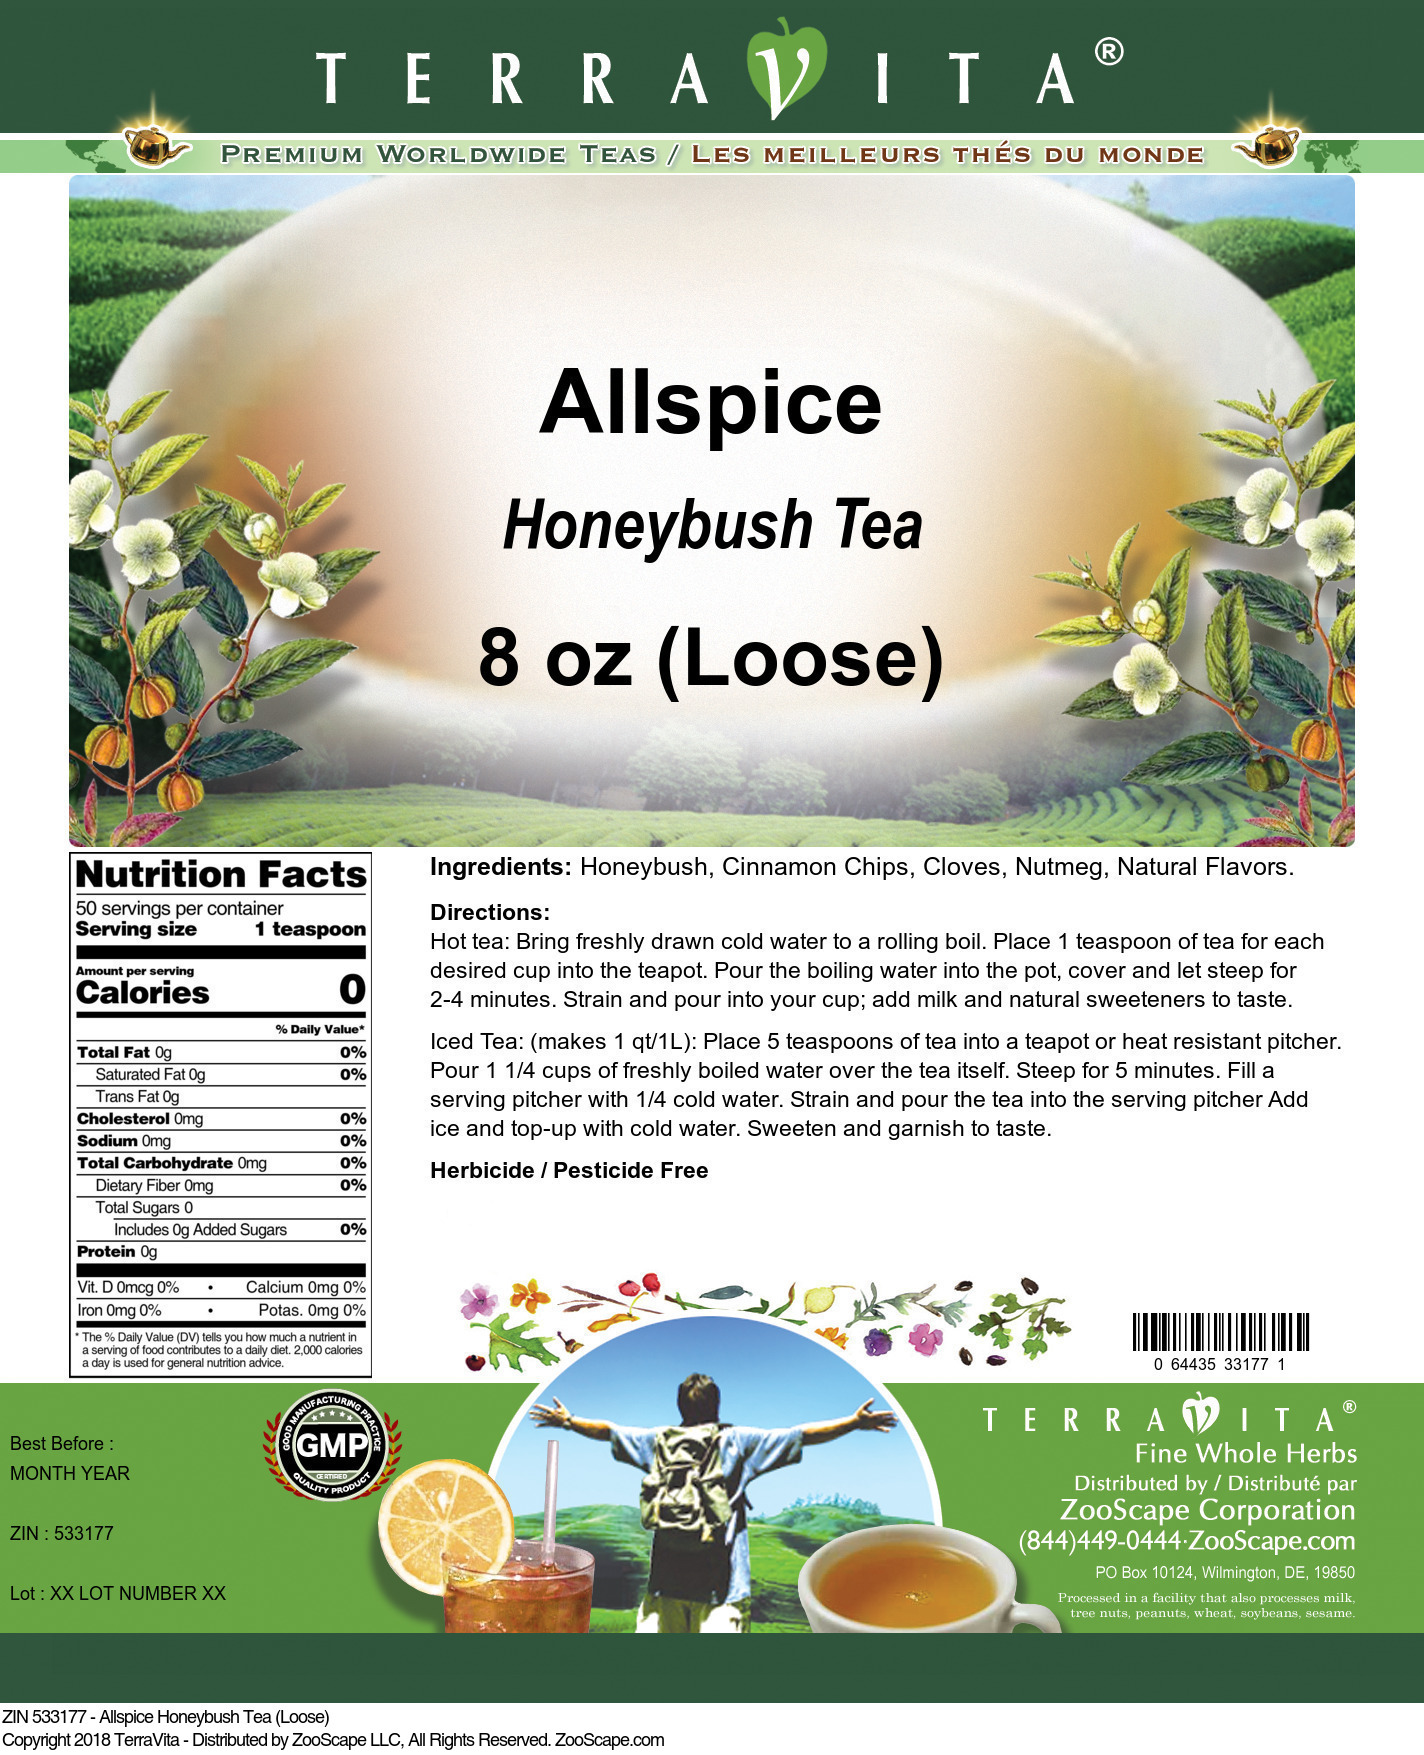 Allspice Honeybush Tea (Loose)